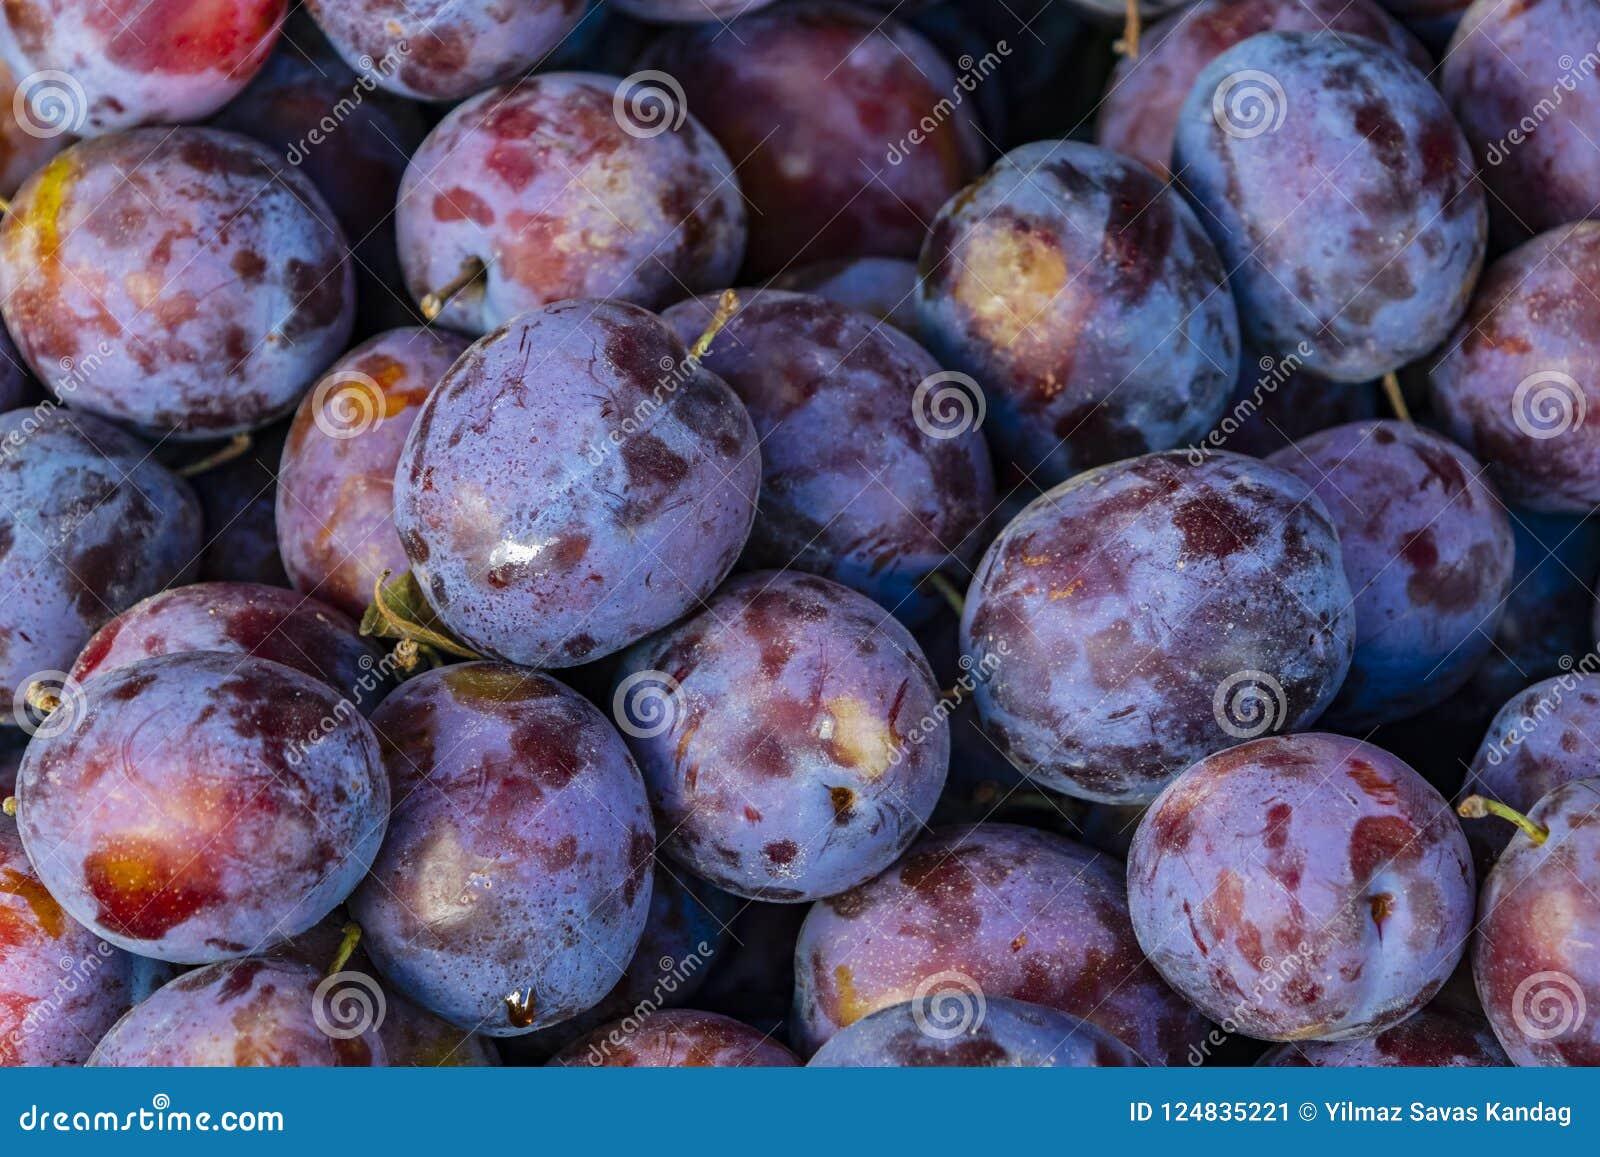 close up damsons. small purple-black plumlike fruit.